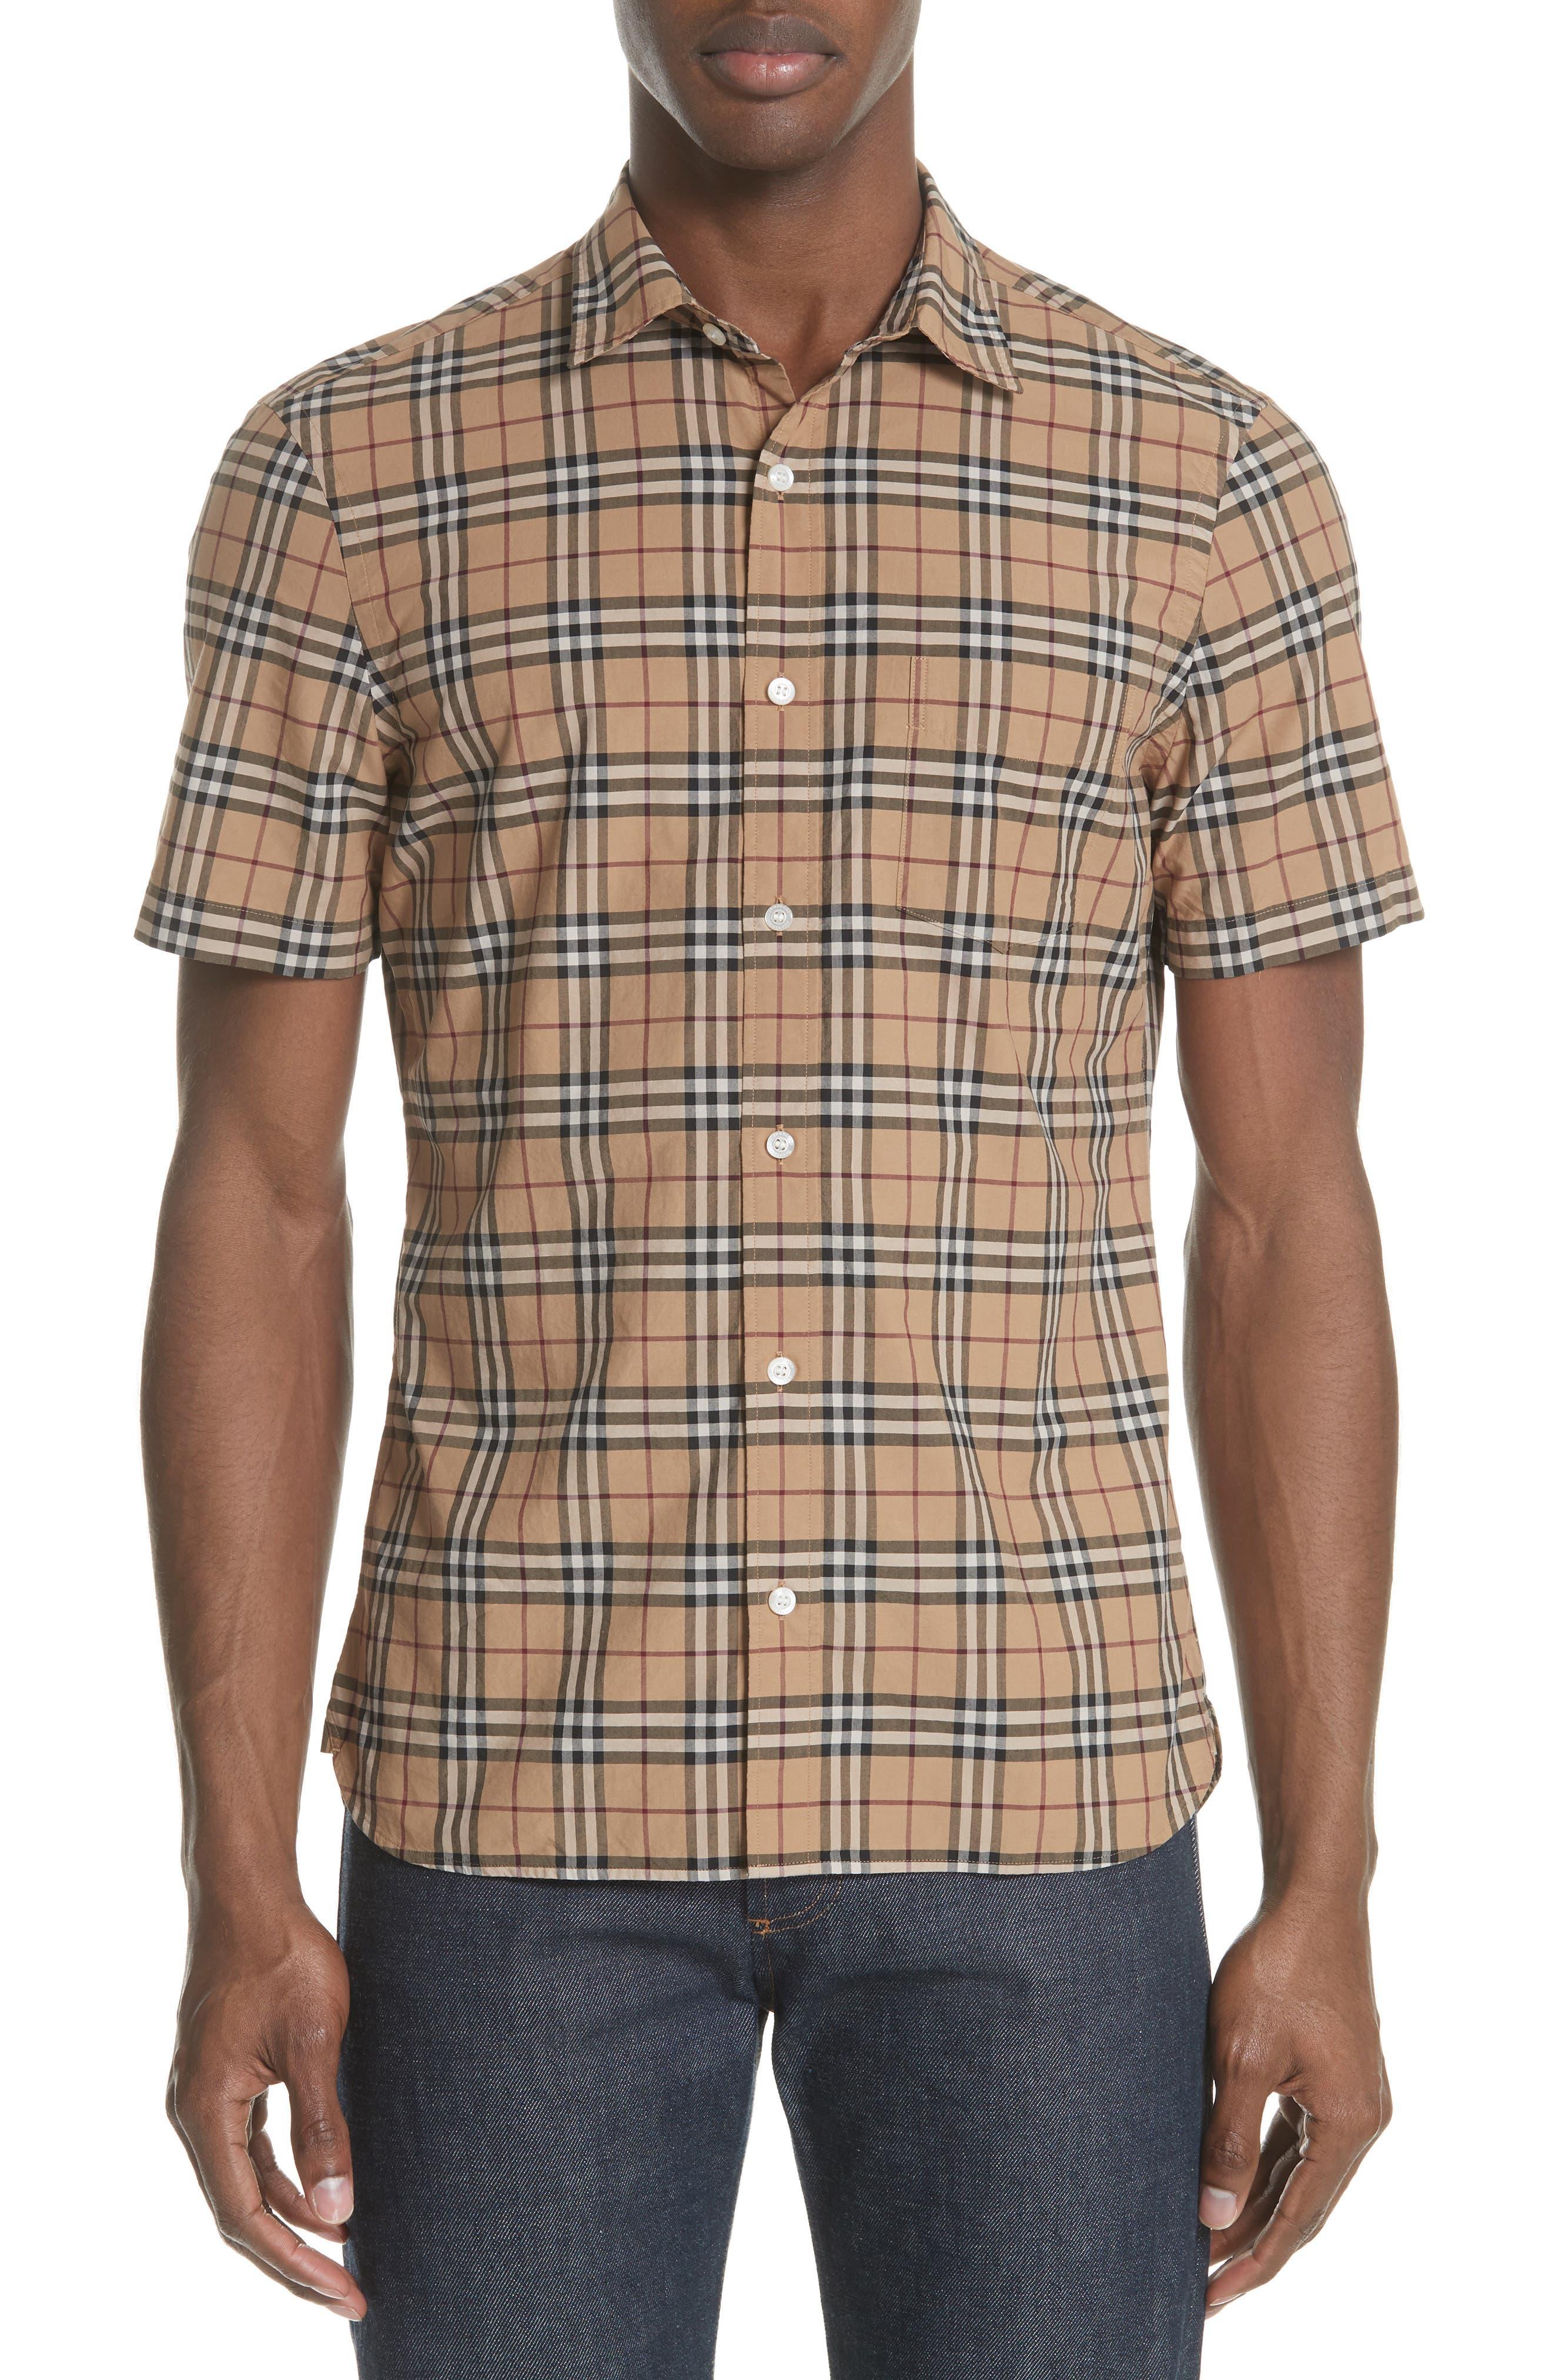 Alexander Check Sport Shirt,                             Main thumbnail 1, color,                             CAMEL